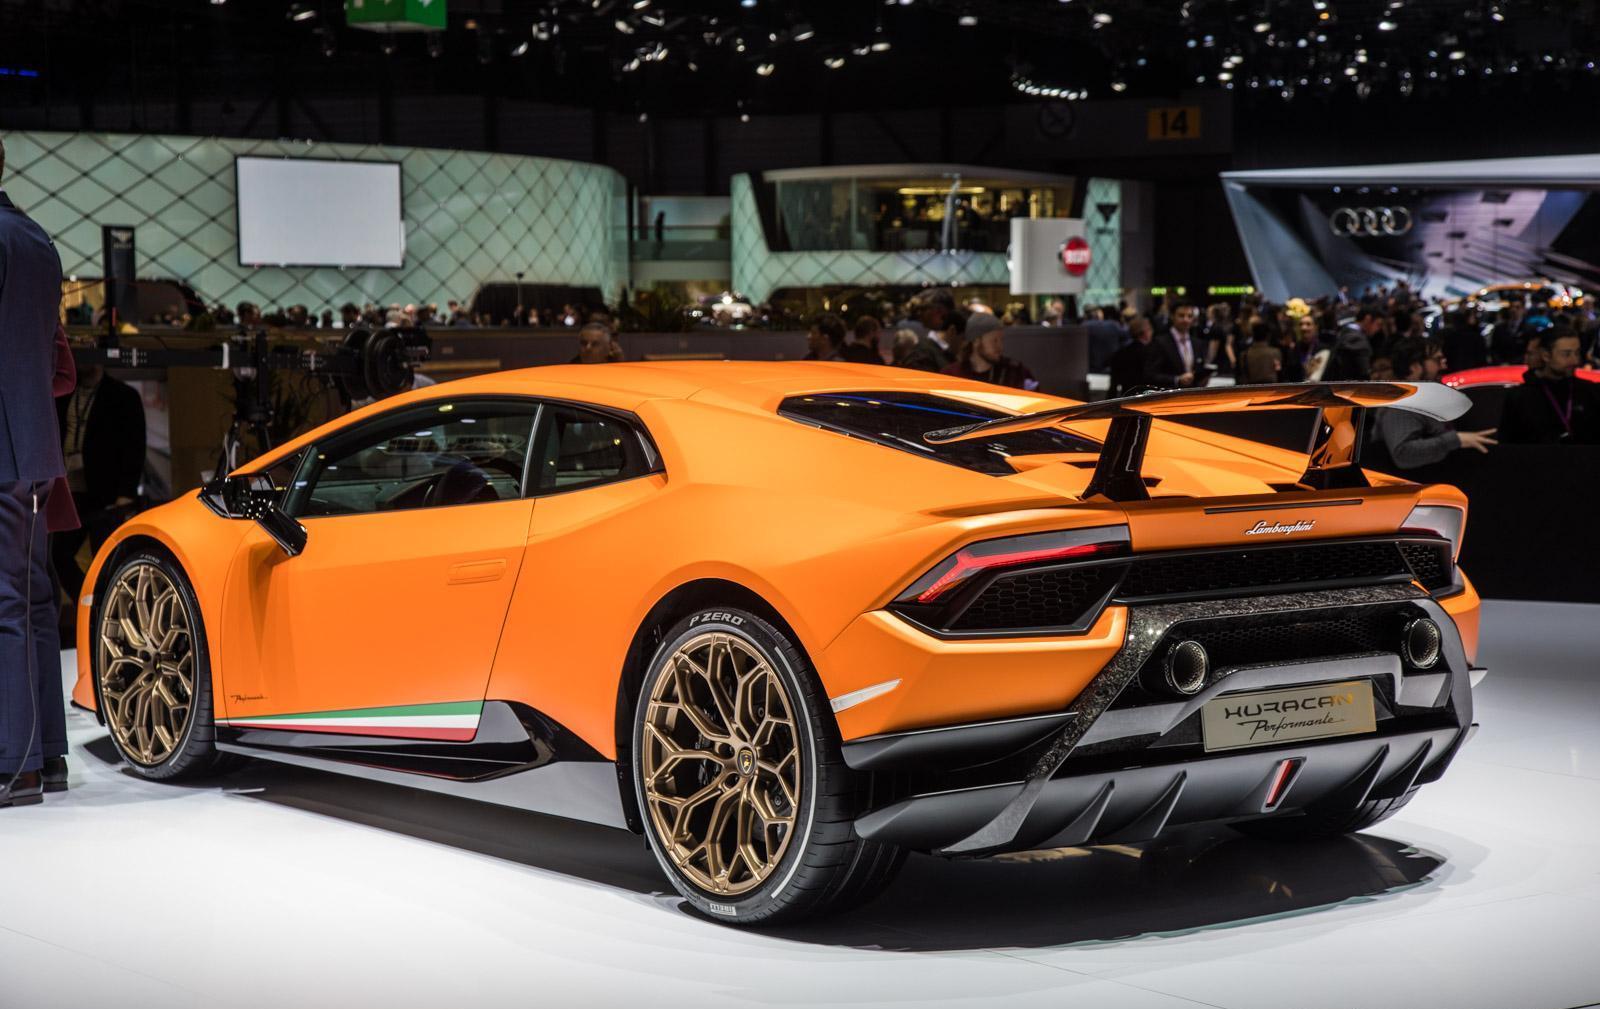 Lamborghini-Huracan-Performante-010